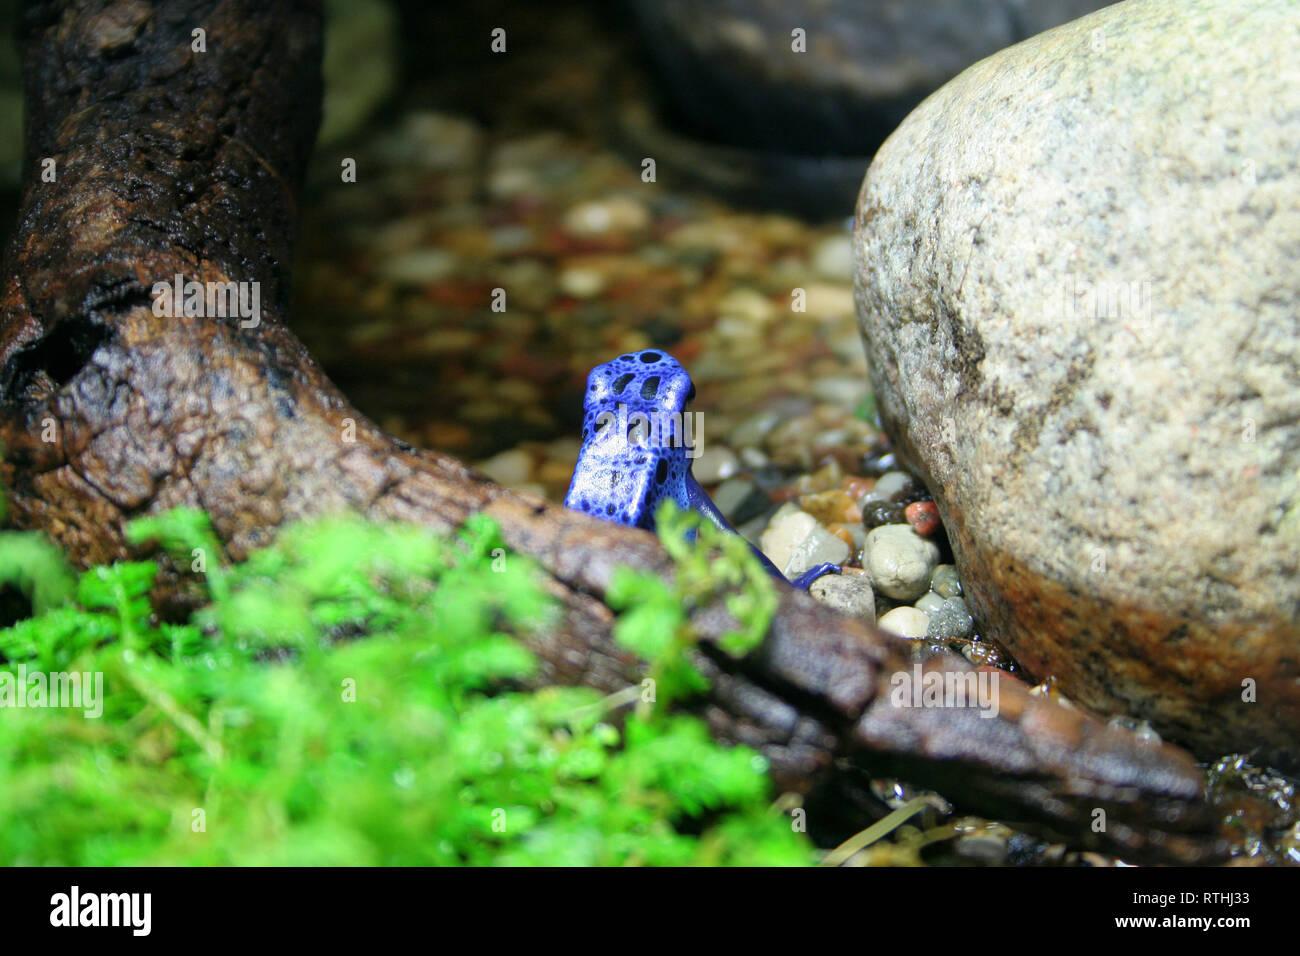 blue frog turned back - Stock Image